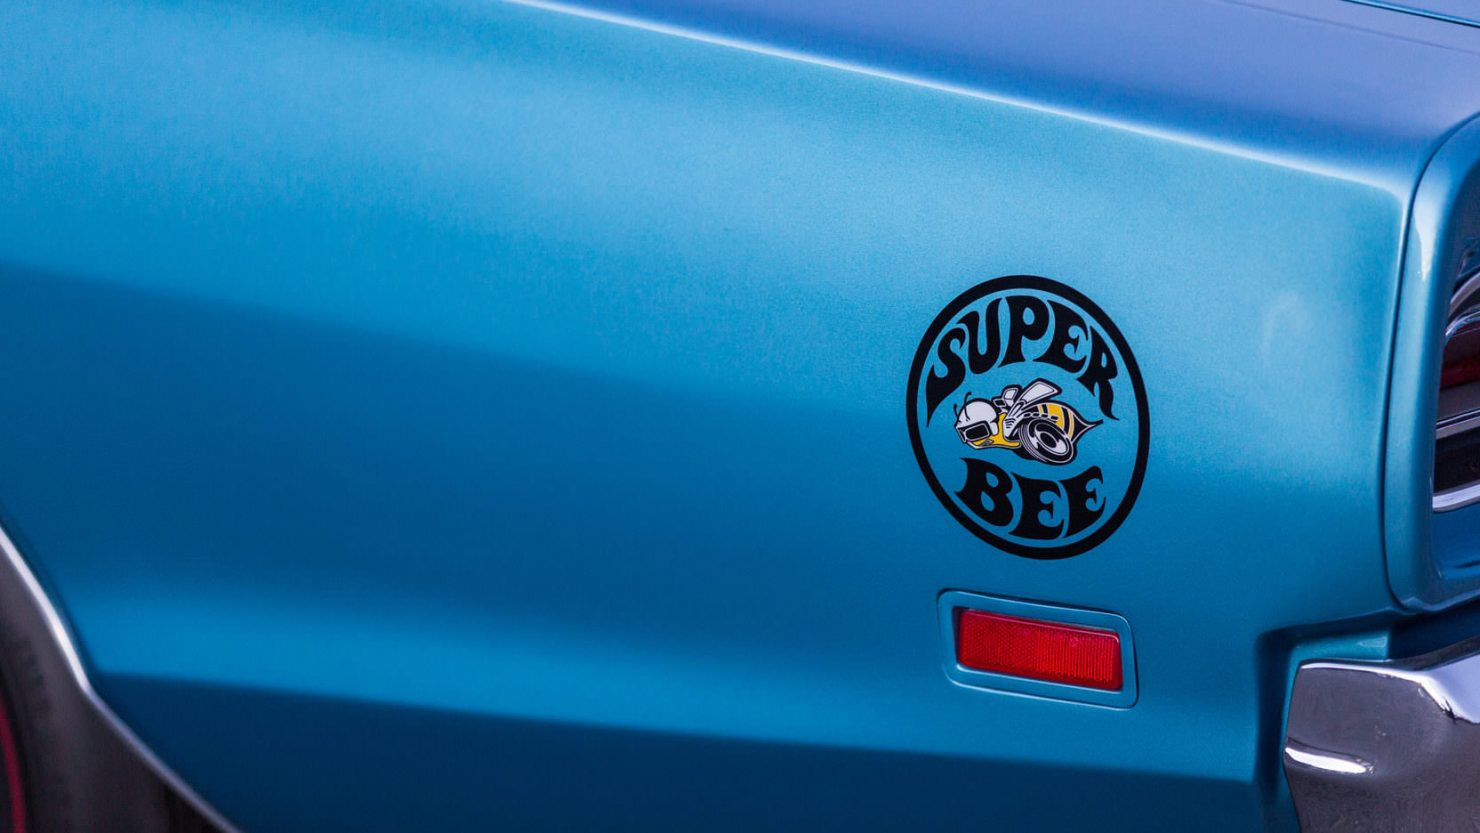 Dodge Super Bee 2 1480x833 - 1969 Dodge Super Bee 440 Six Pack